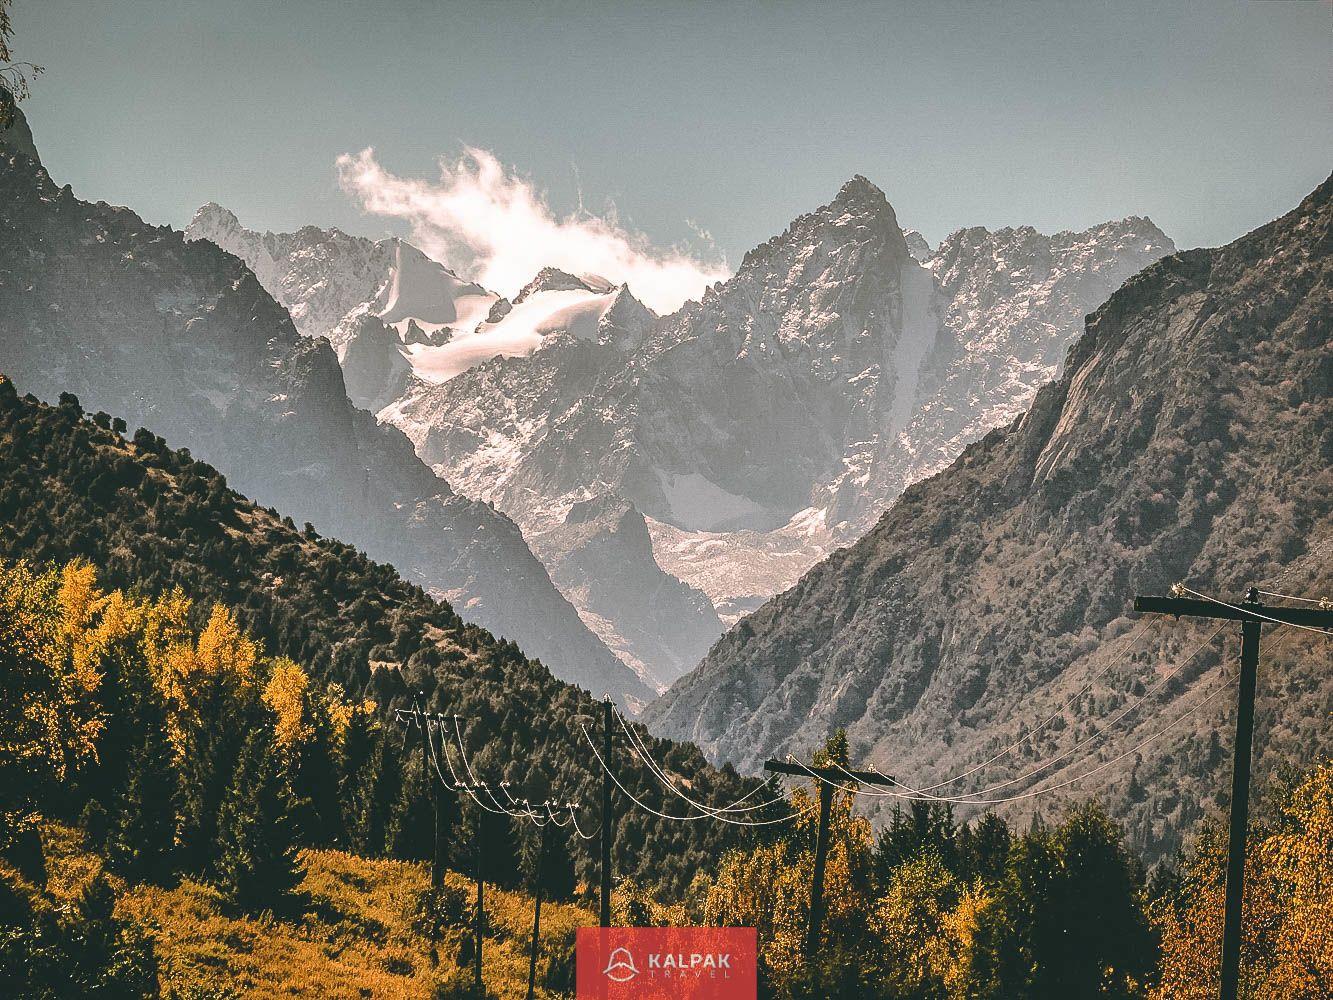 Central Asia, National Park Ala Archa near Bishkek